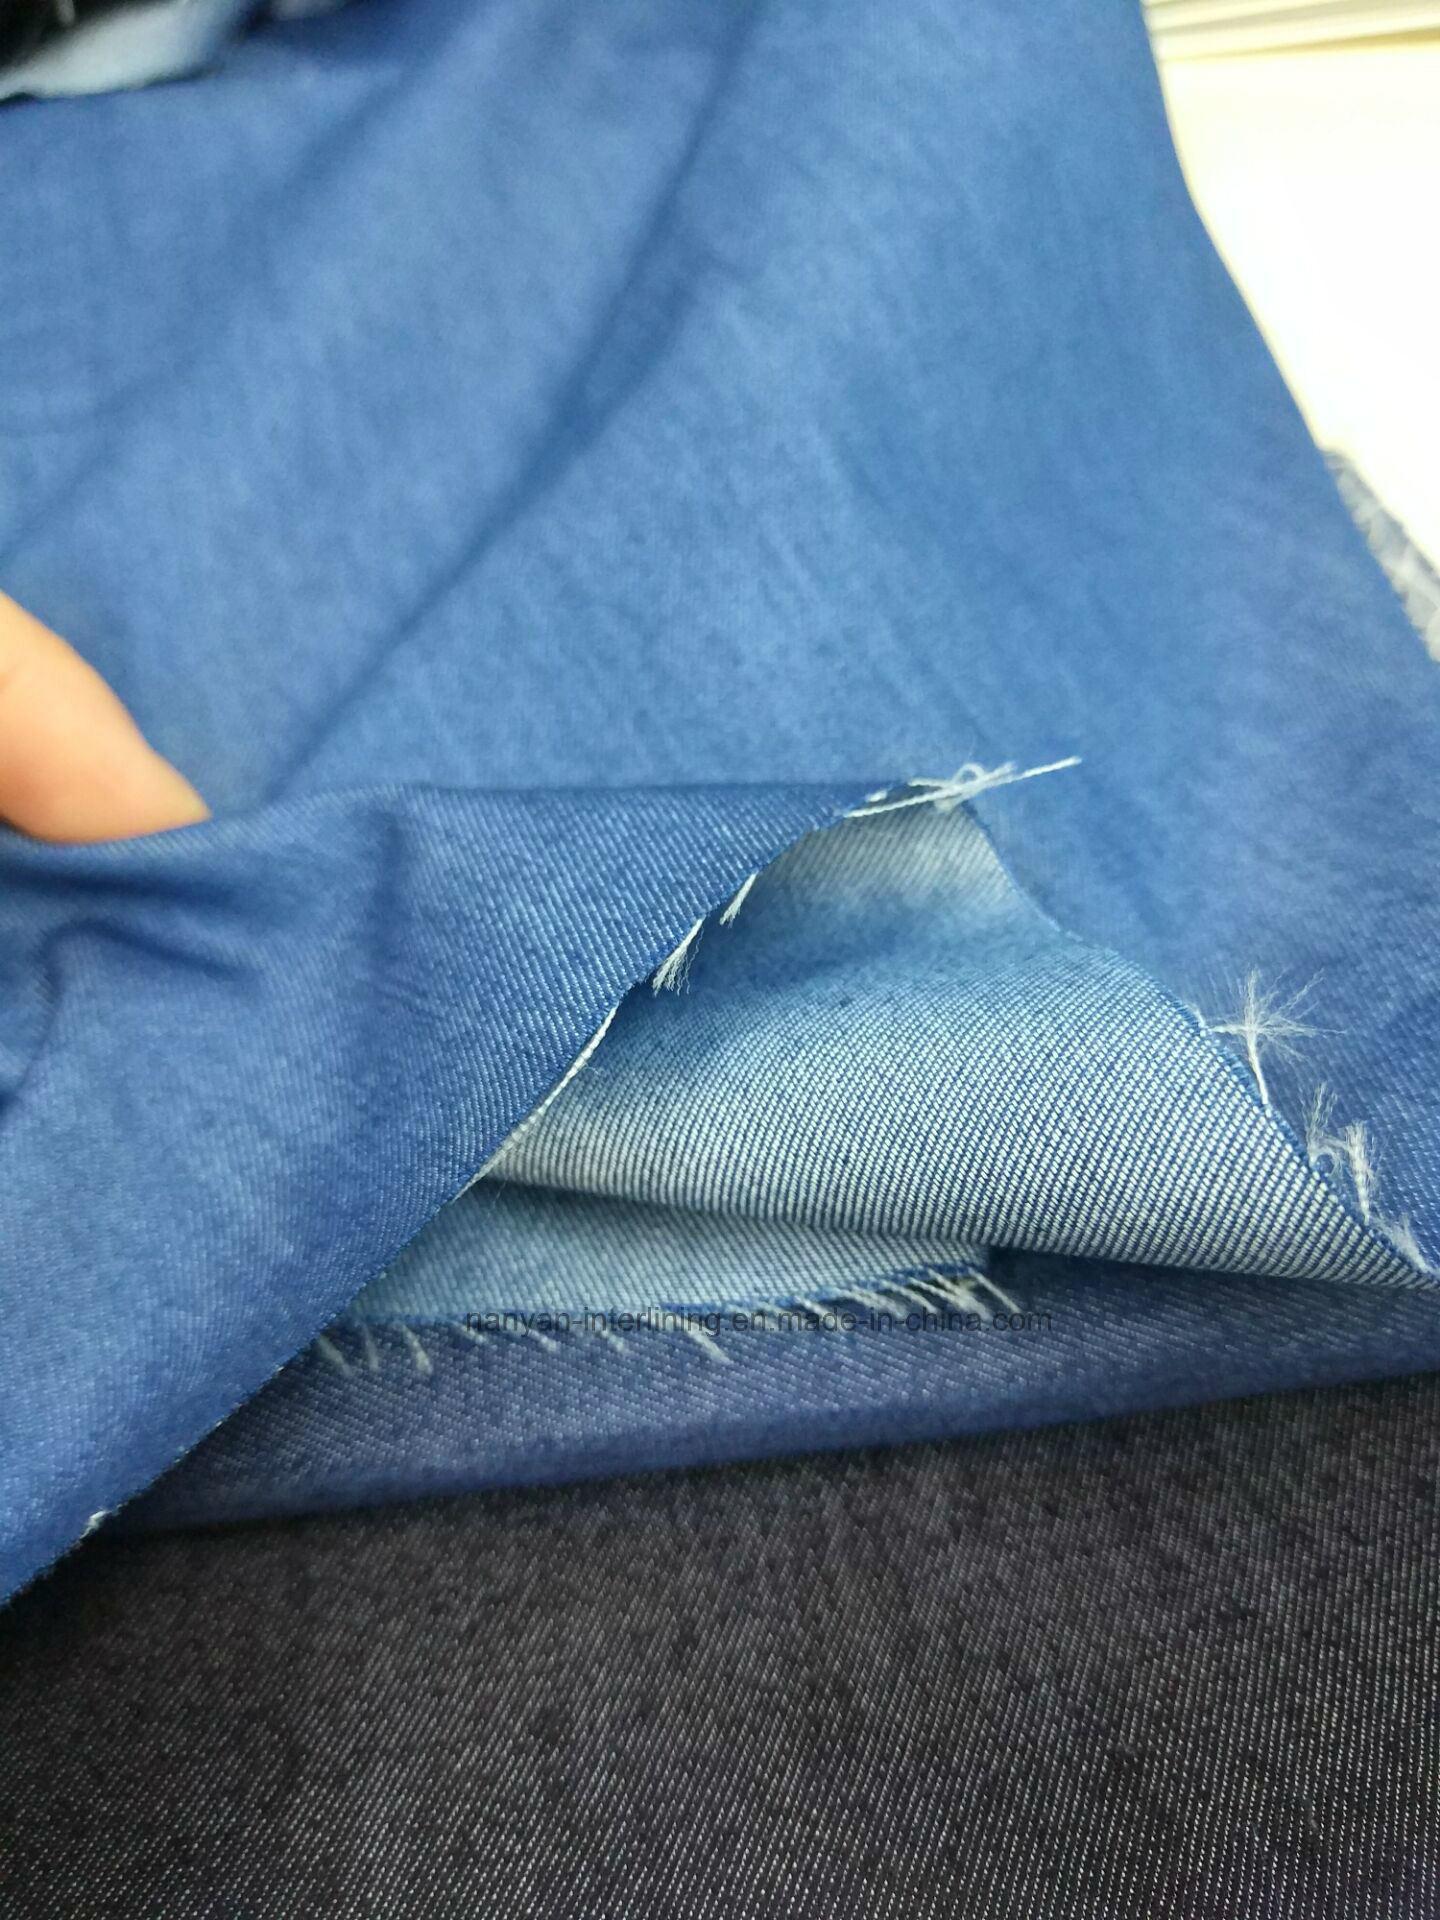 Woven Denim Fablic Indigo Twill Cotton Polyester Spandex Stretch Mercerizing